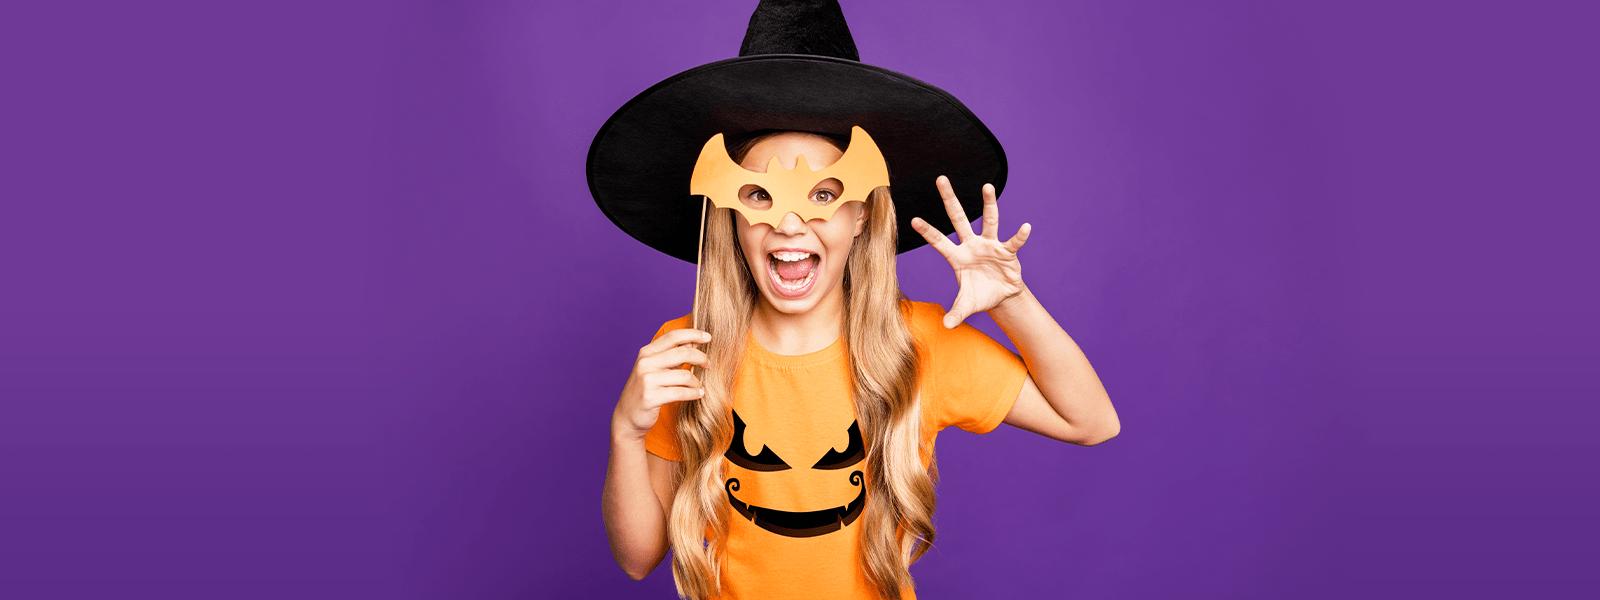 Fun Ideas for Celebrating Halloween